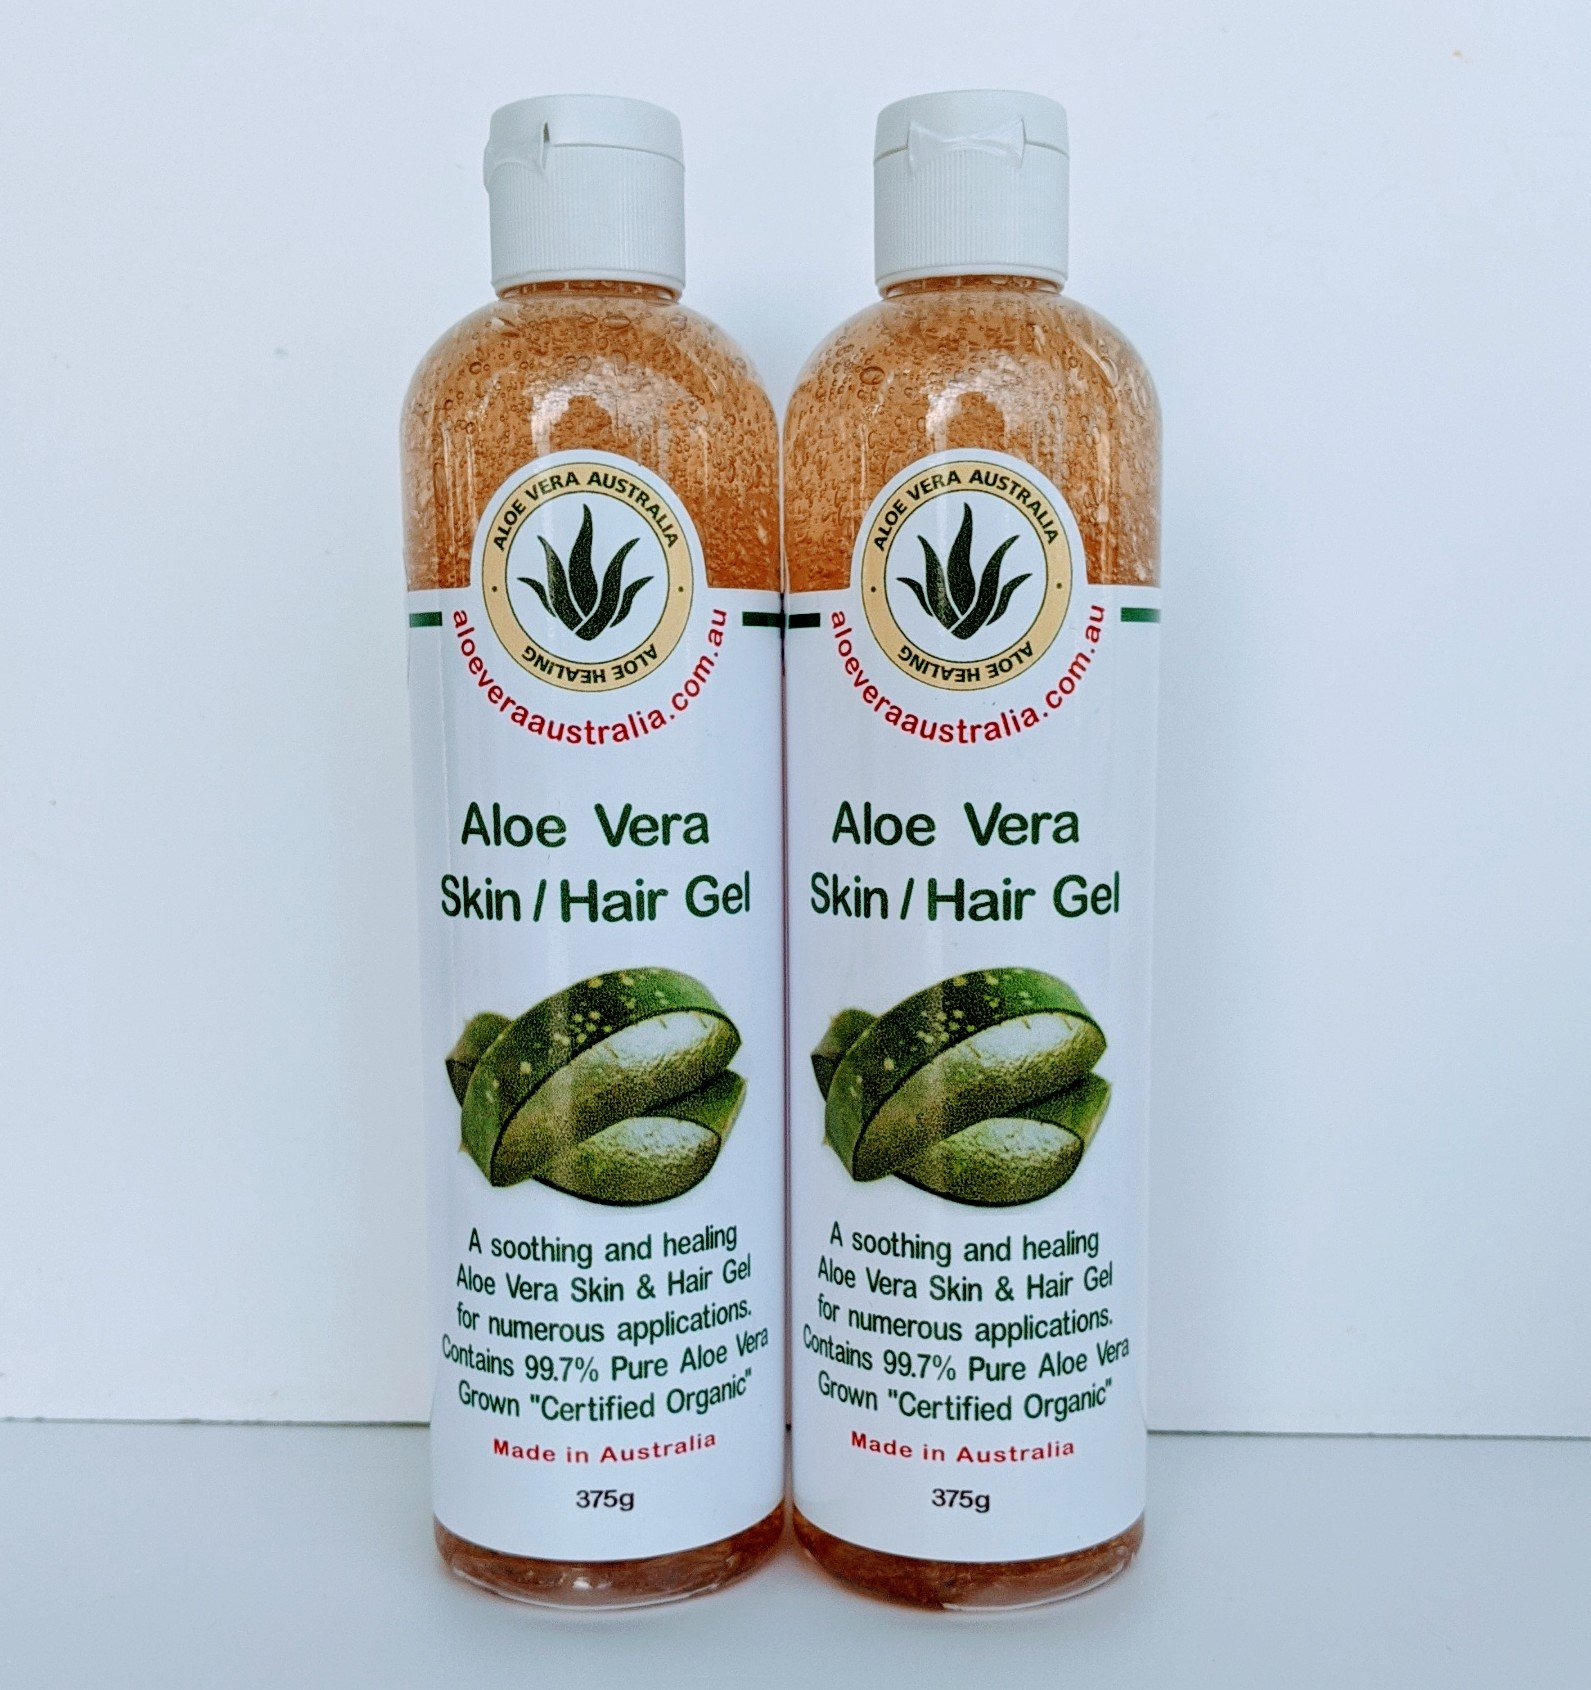 375g Aloe Vera Skin Hair Gel 99% PURE